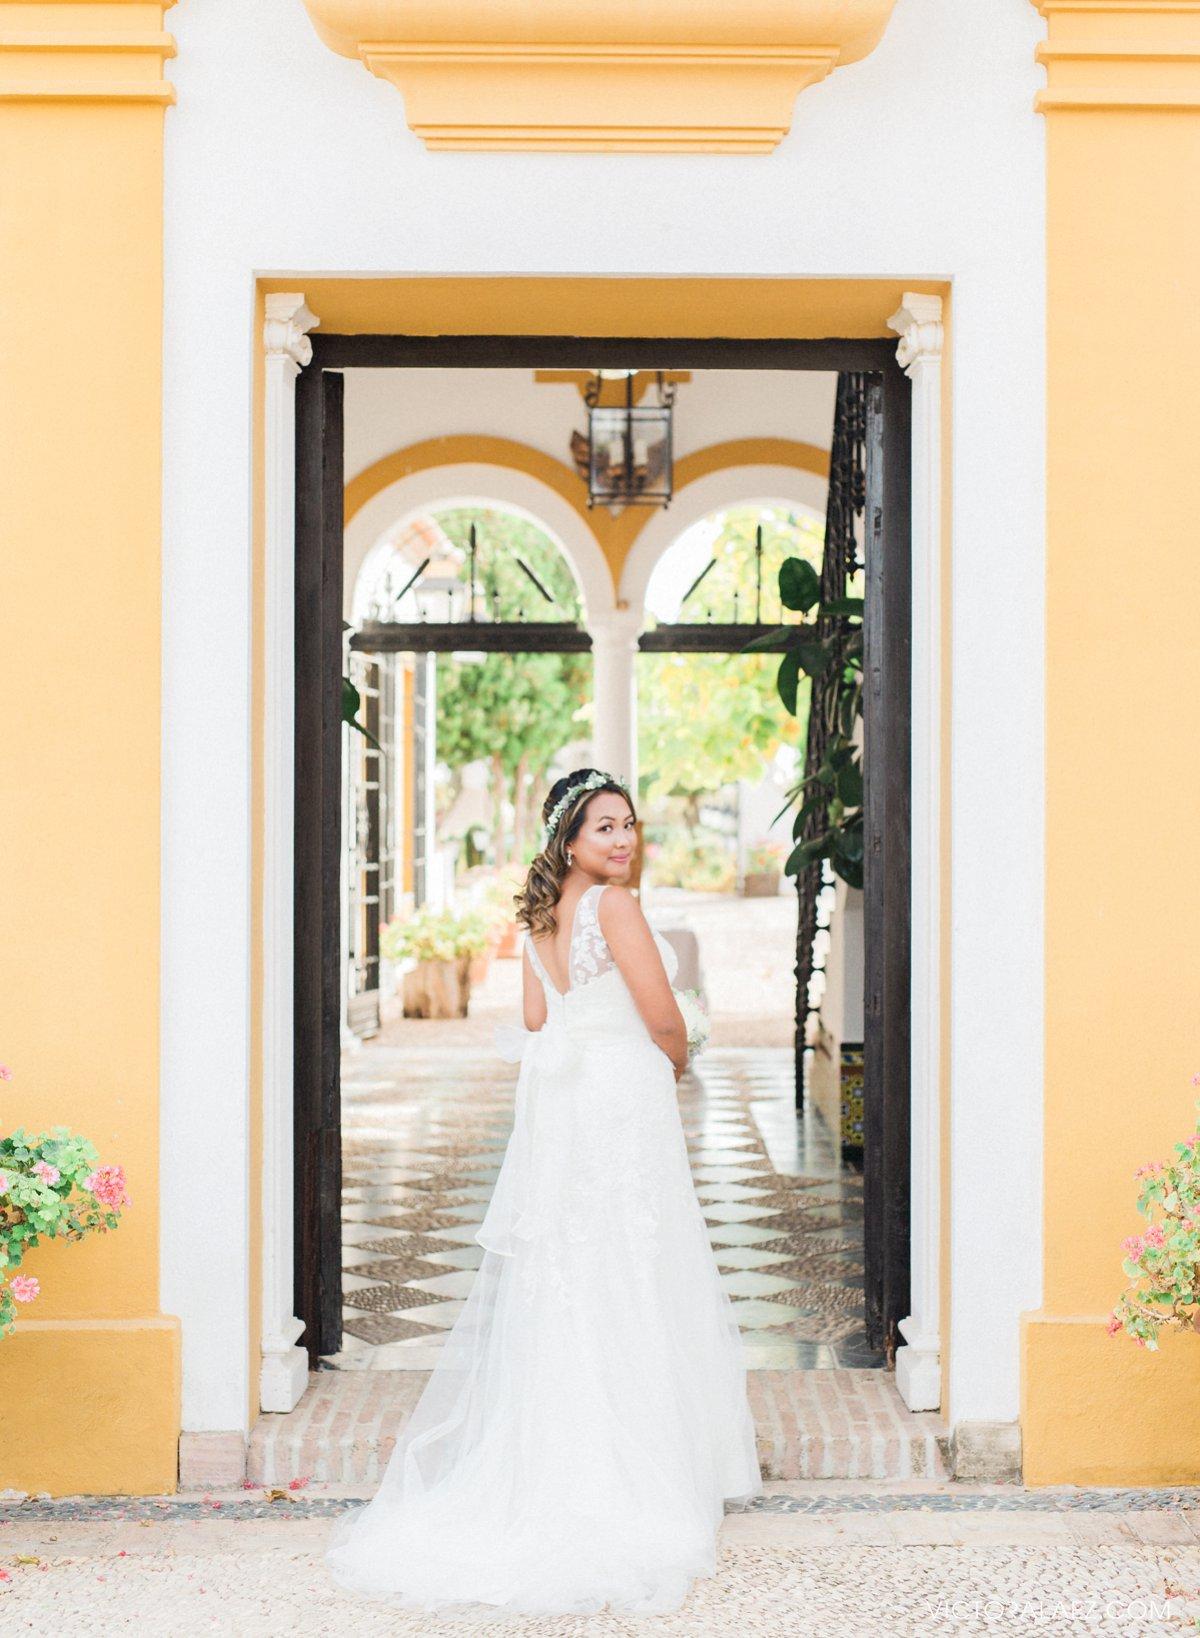 Bridal Portraits in Hacienda la Torre, Cordoba